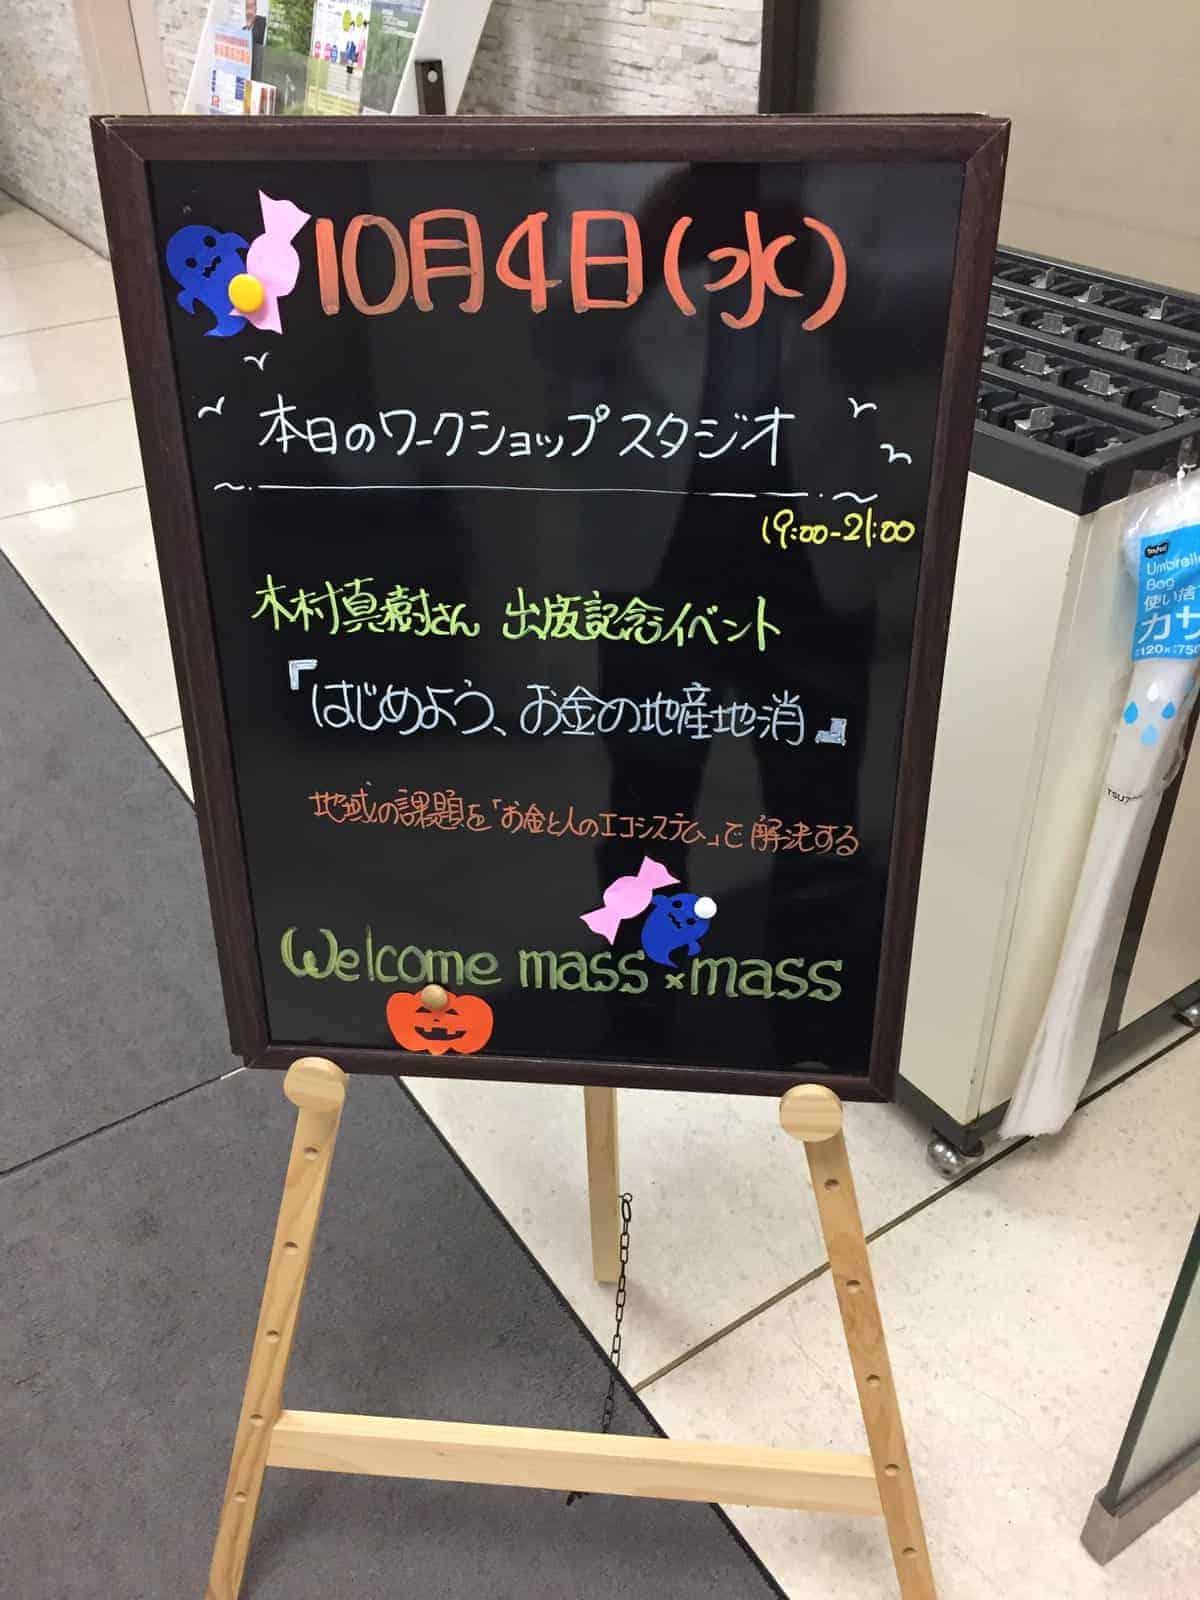 IMG 7488 - 台風で中止!?金沢文庫芸術祭開催への道のり